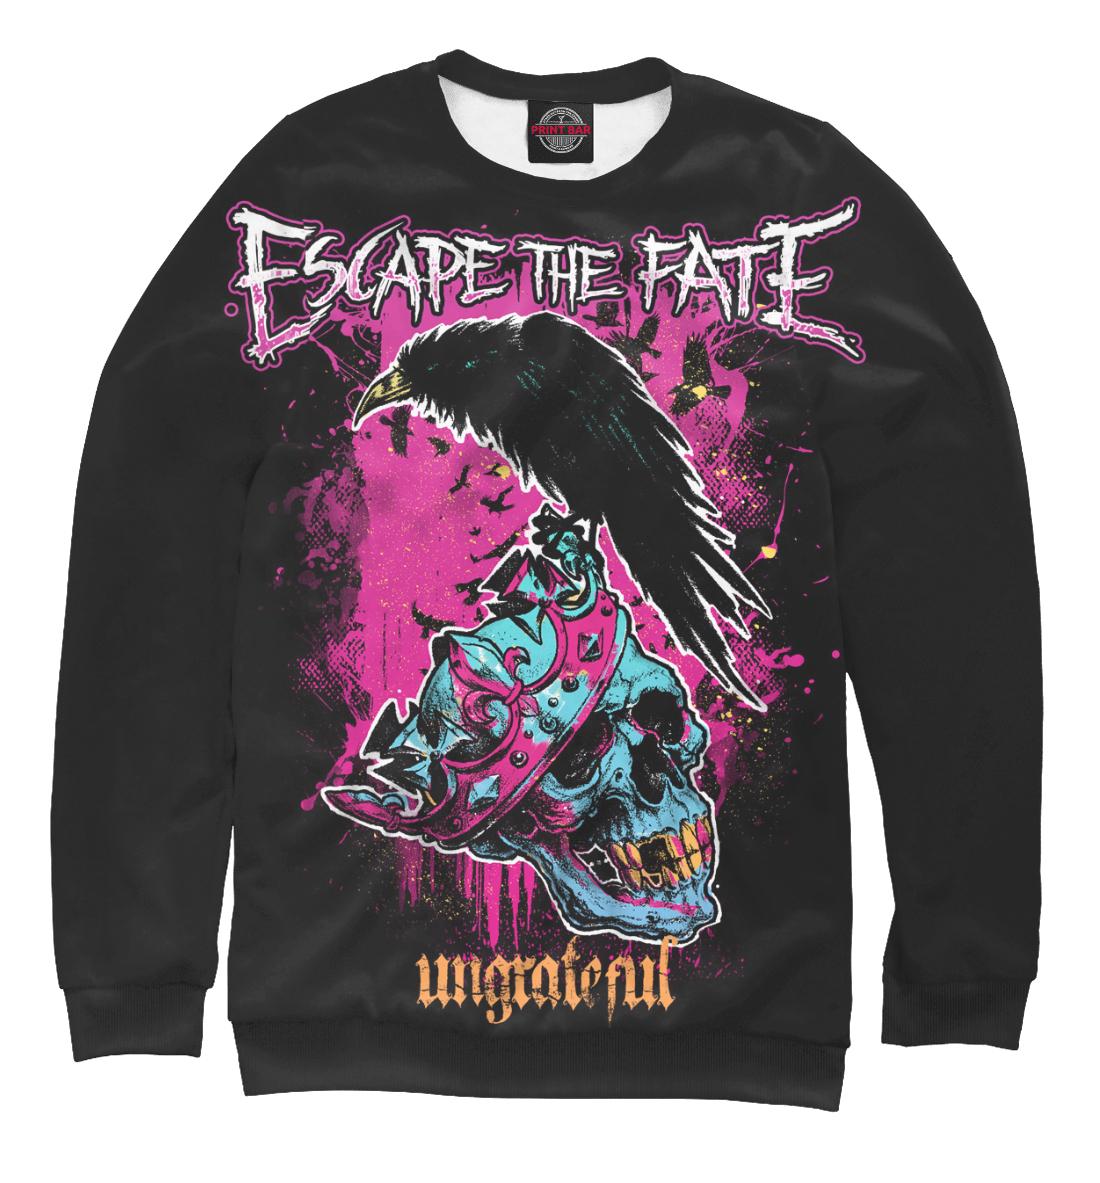 Купить Escape The Fate, Printbar, Свитшоты, MZK-261706-swi-1